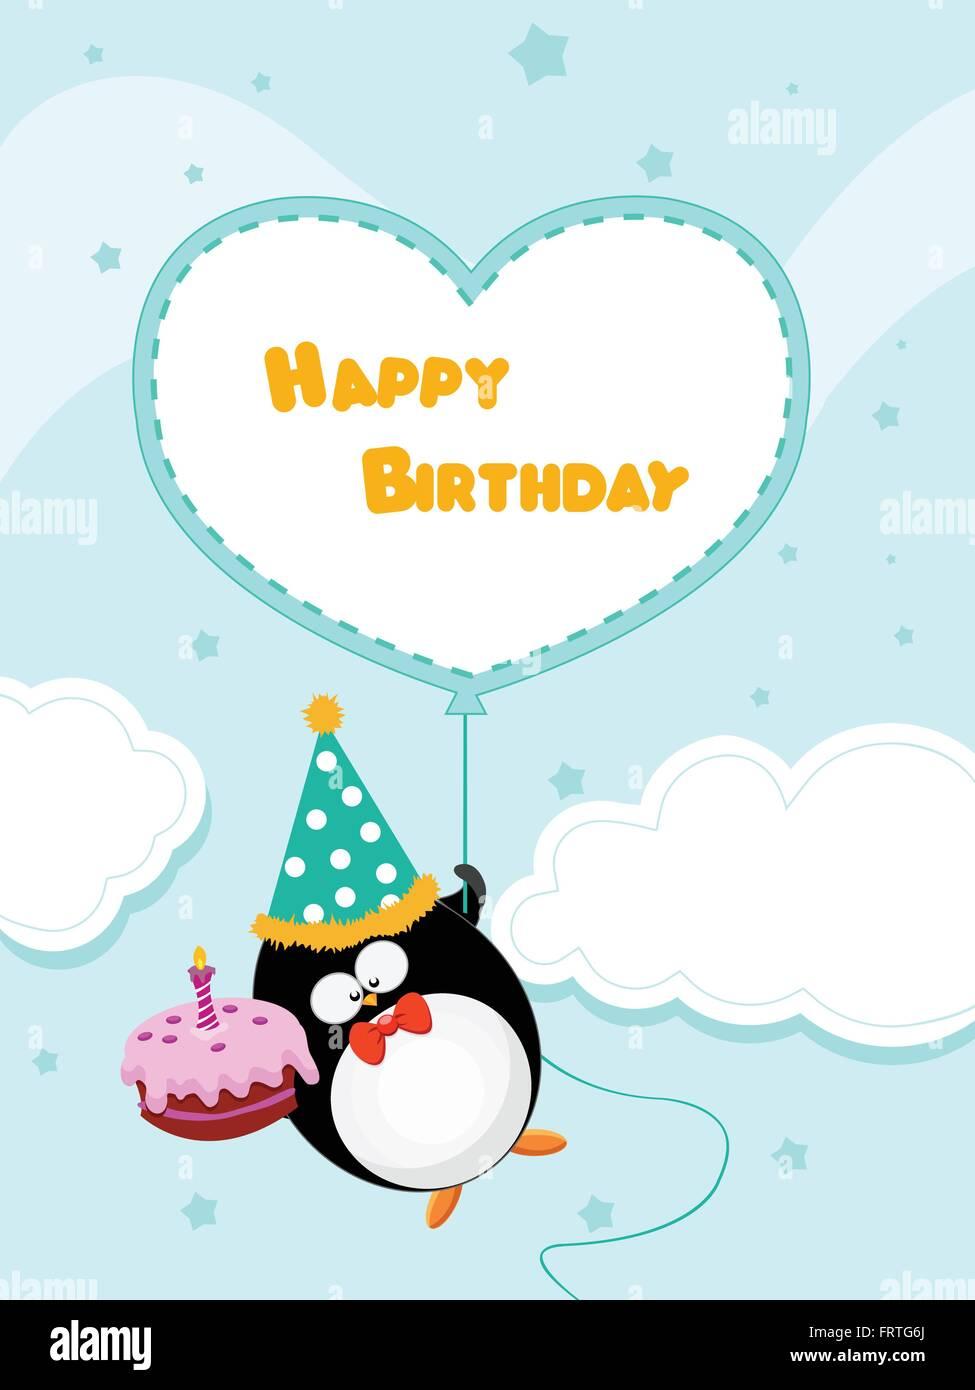 Happy Birthday Pinguin Card Vektor Abbildung Bild 100728506 Alamy